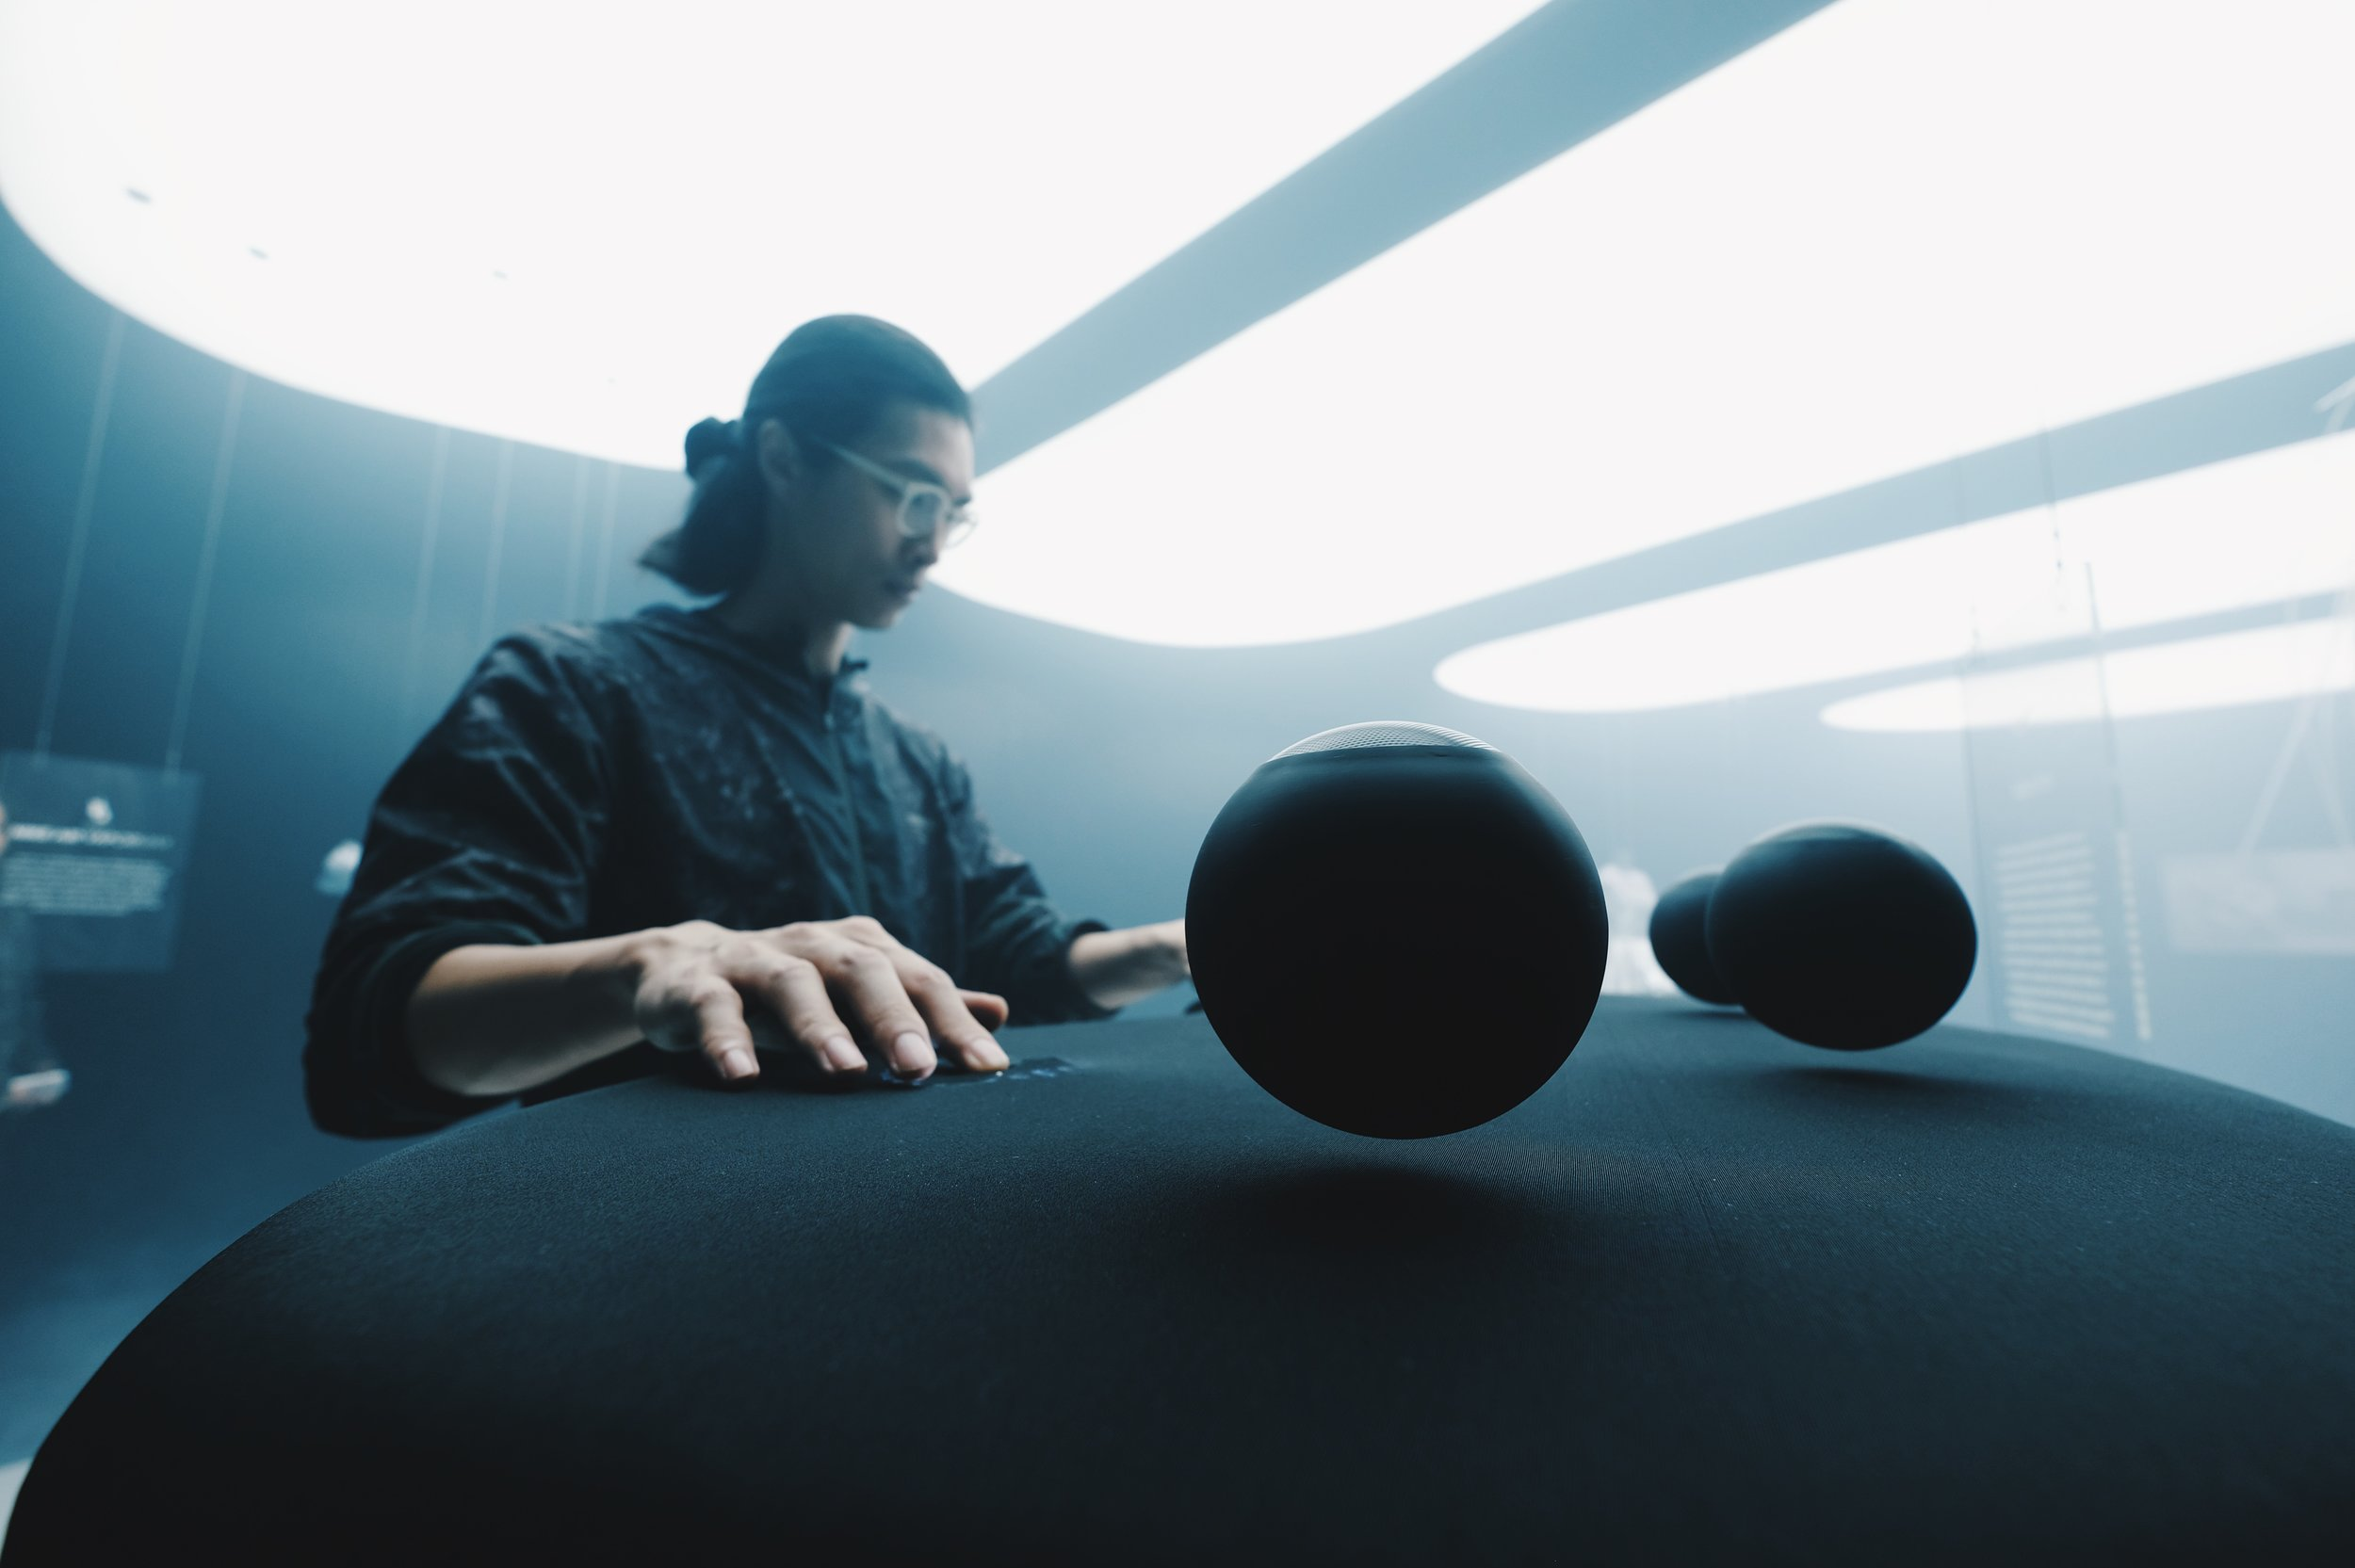 Chris Cheung, VaporScape, 2017